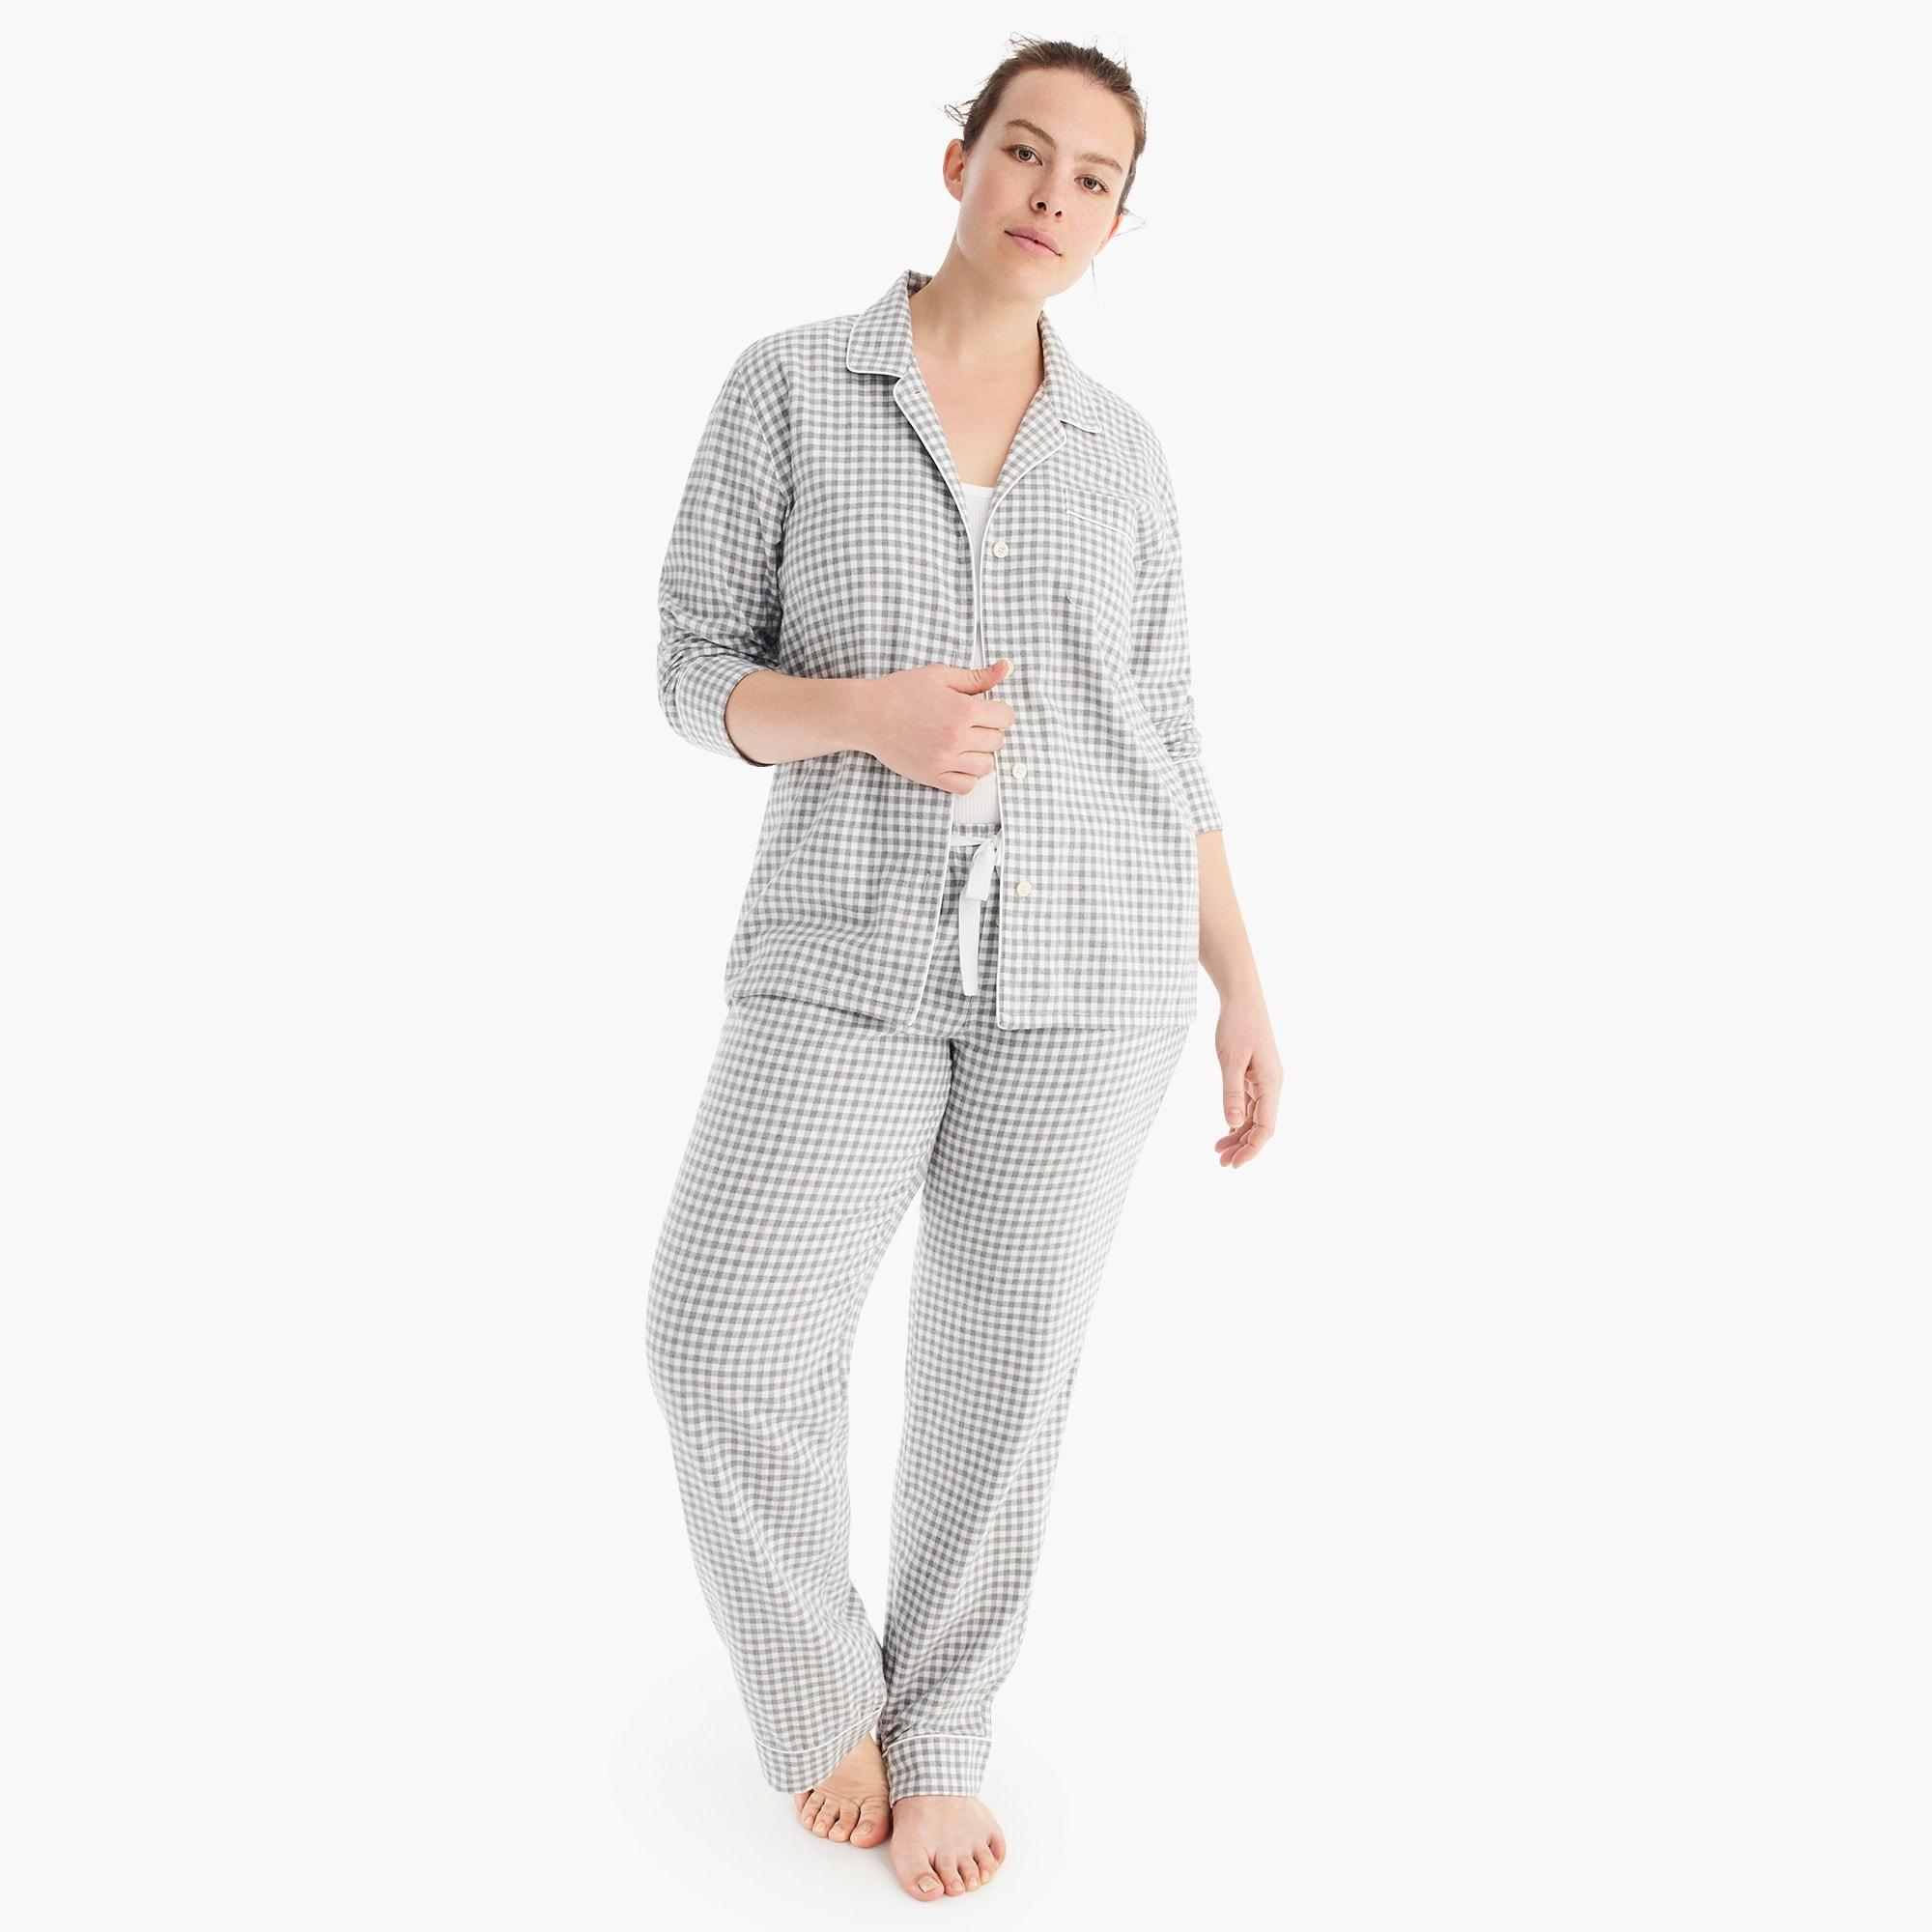 womens Vintage pajama set in flannel gingham